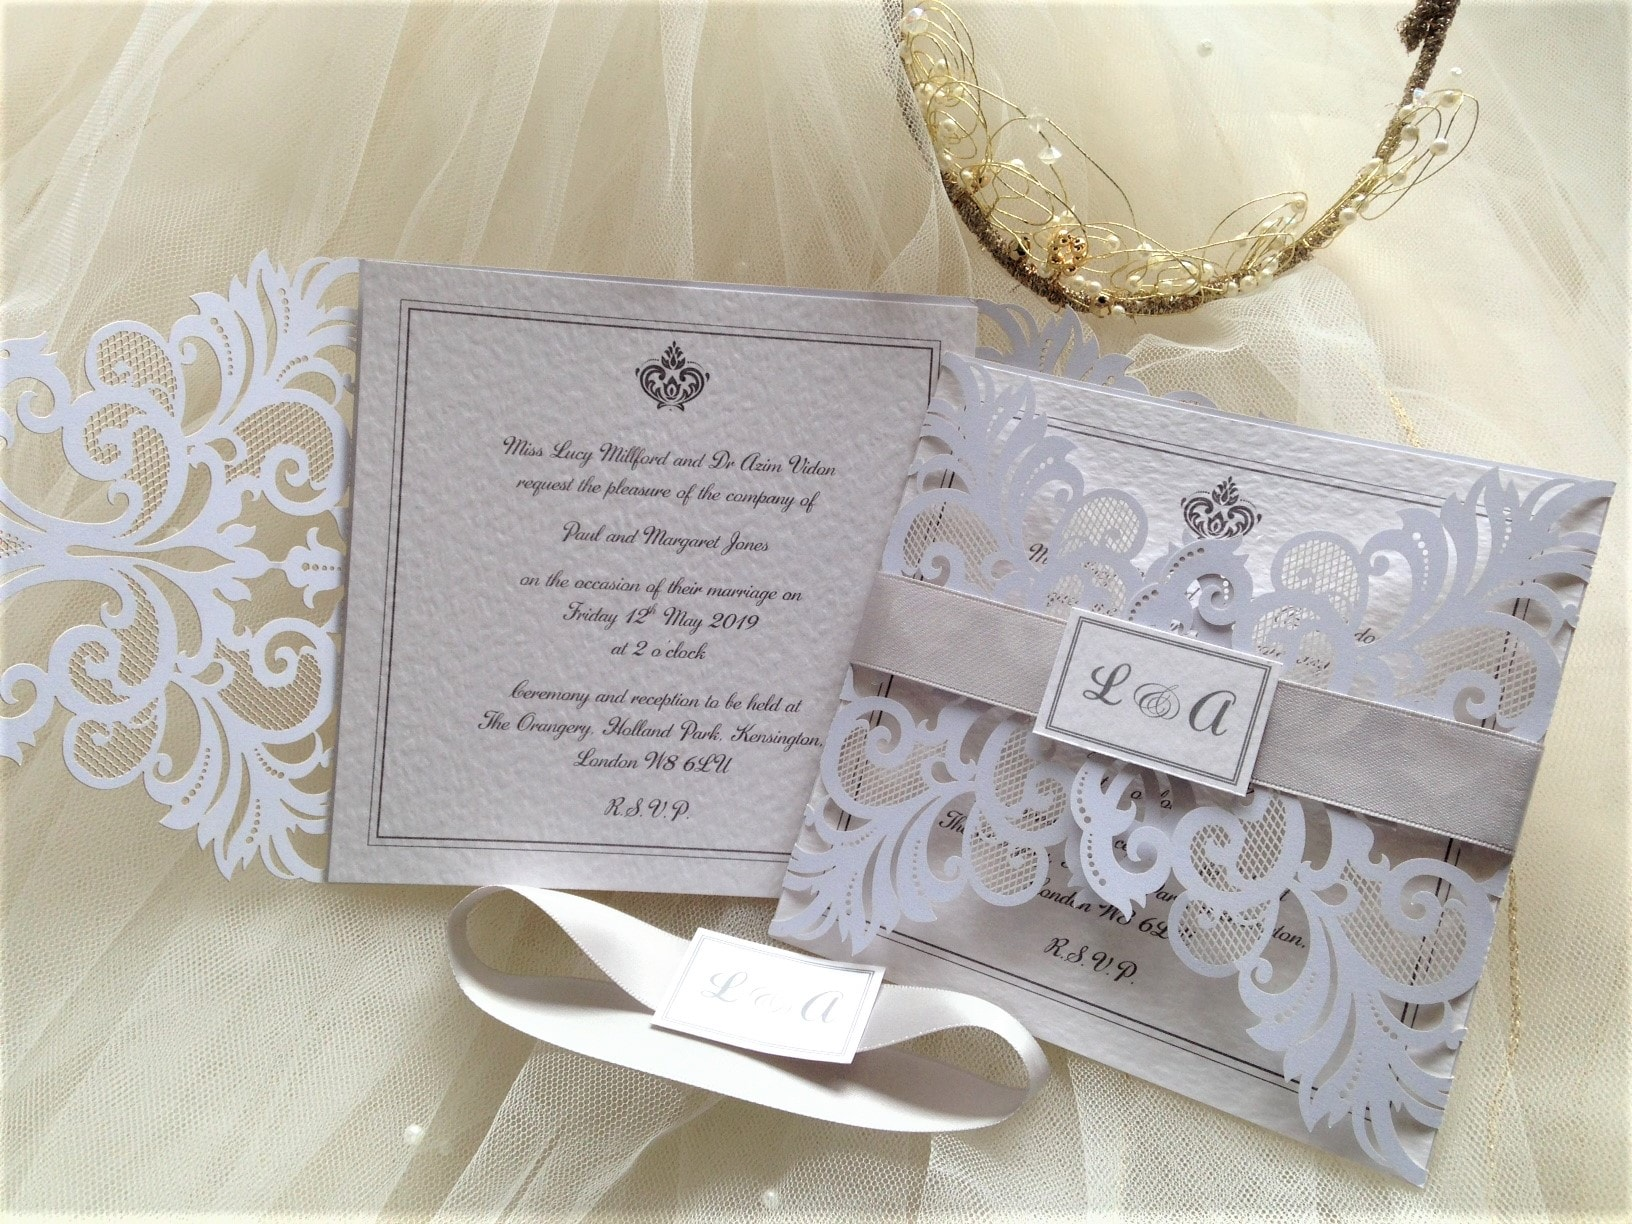 Cheap Laser Cut Wedding Invitations Uk: Affordable Wedding Invites 60p